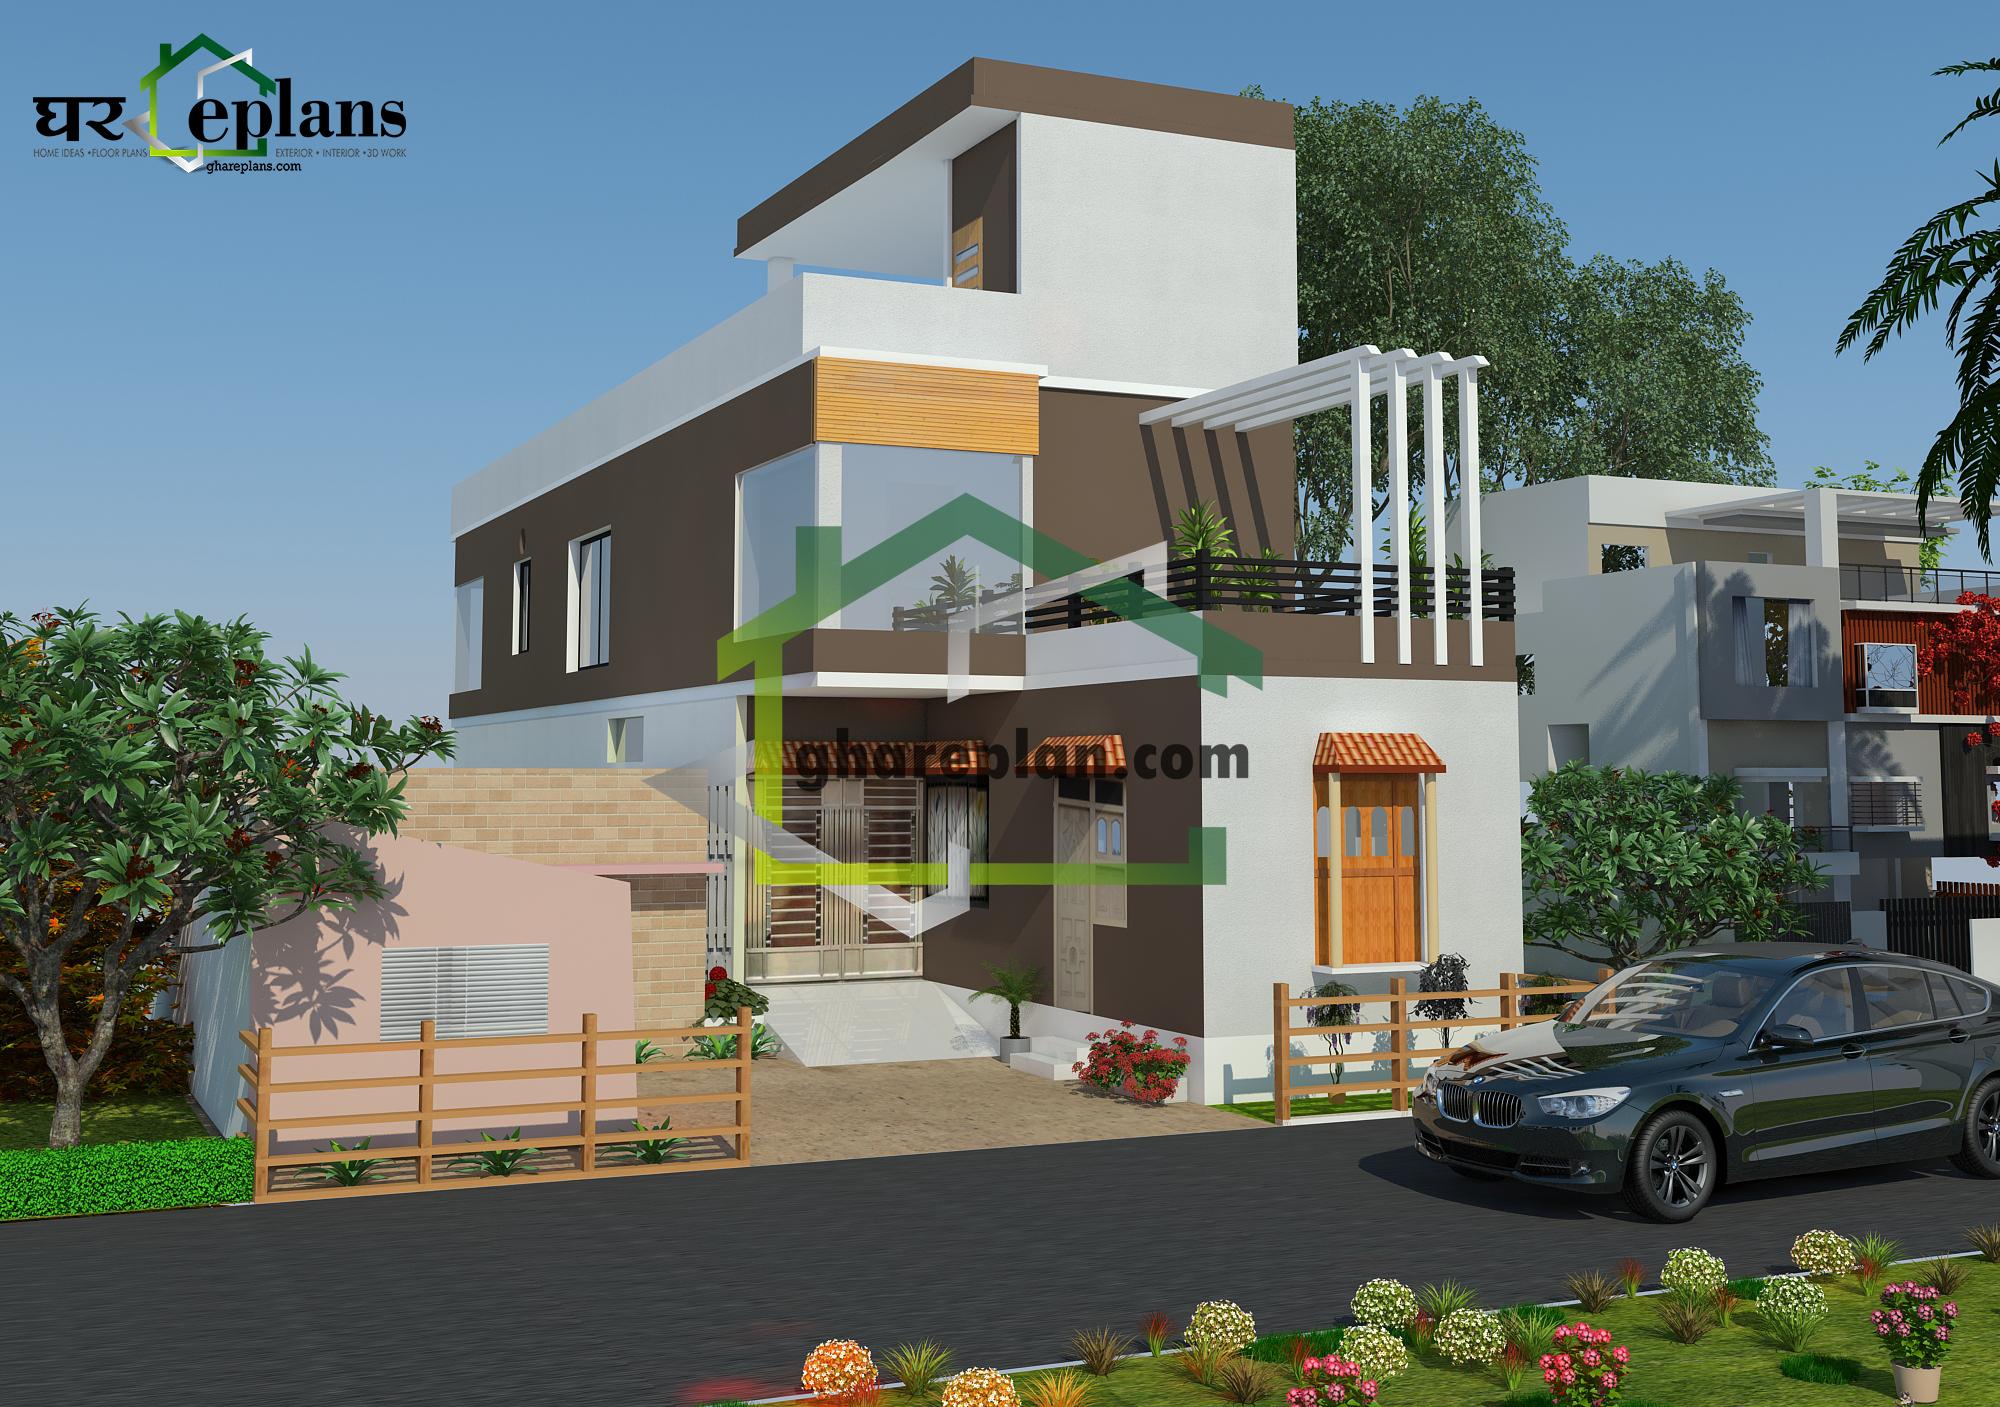 West Facing House Ground Floor Elevation : Best elevation deisgns for west facing two floor house